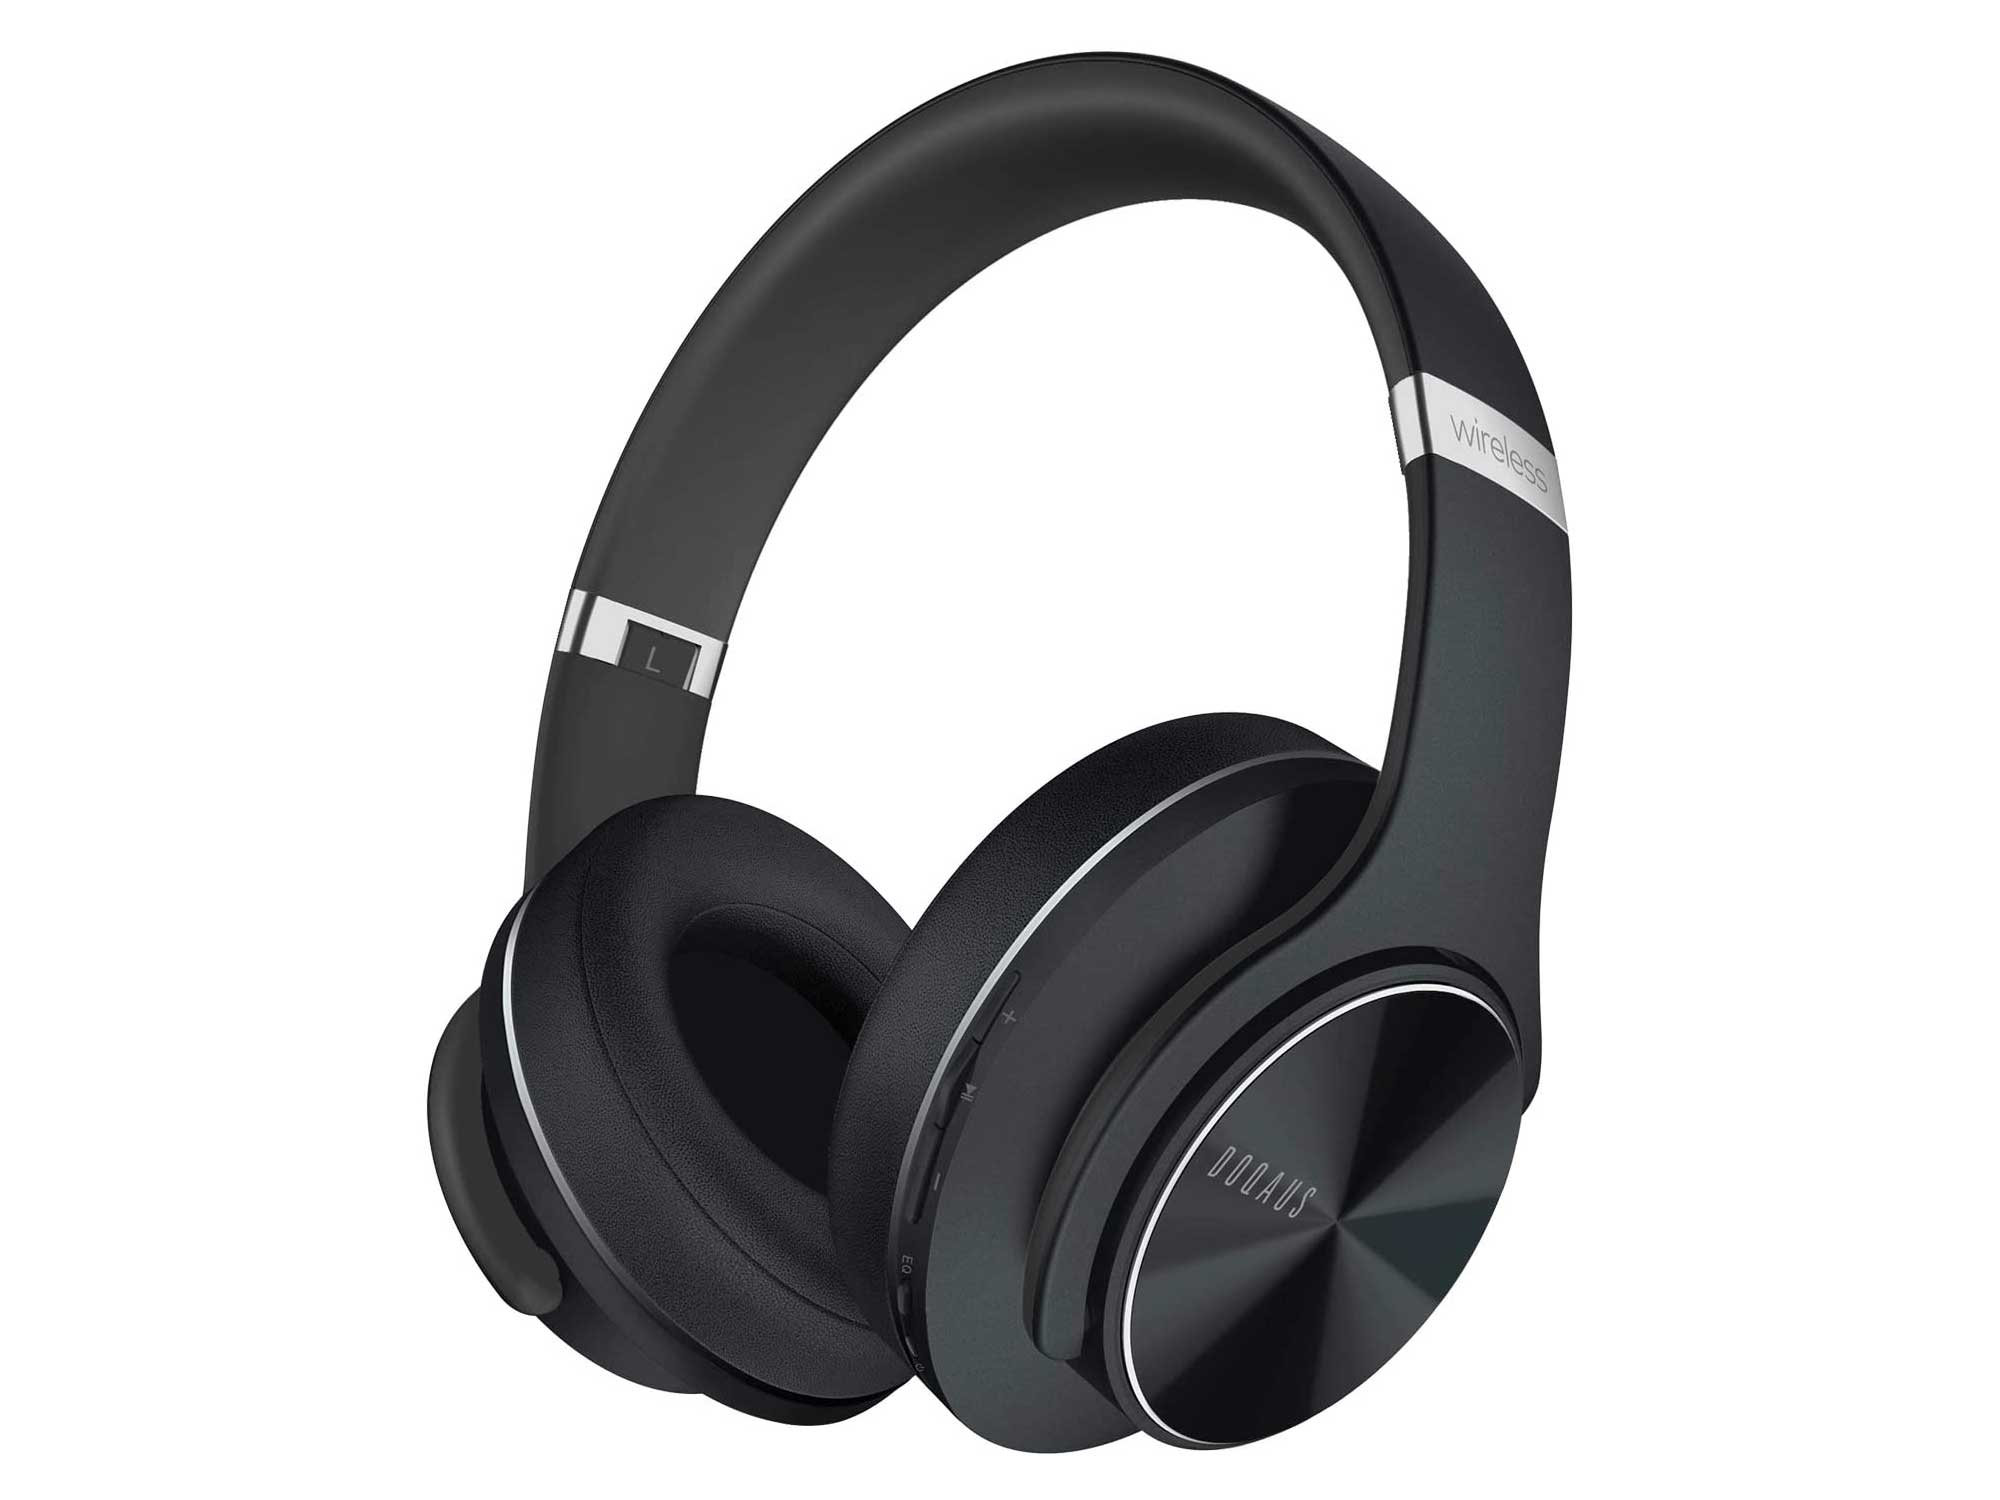 DOQAUS Bluetooth Headphones Over Ear, [52 Hrs Playtime] Wireless Headphones